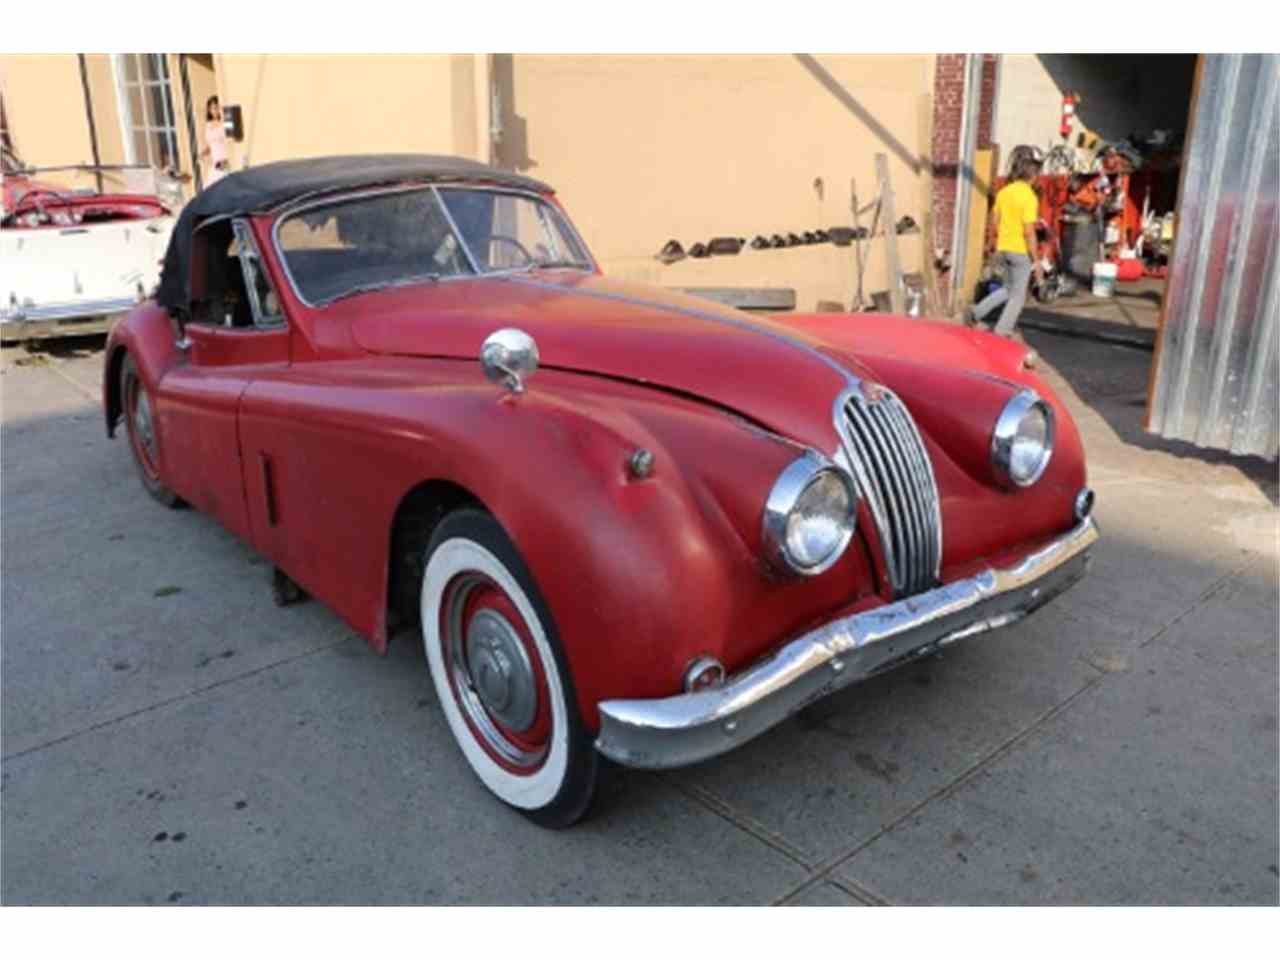 sale import york queens for near classic cars xk new car classics jaguar